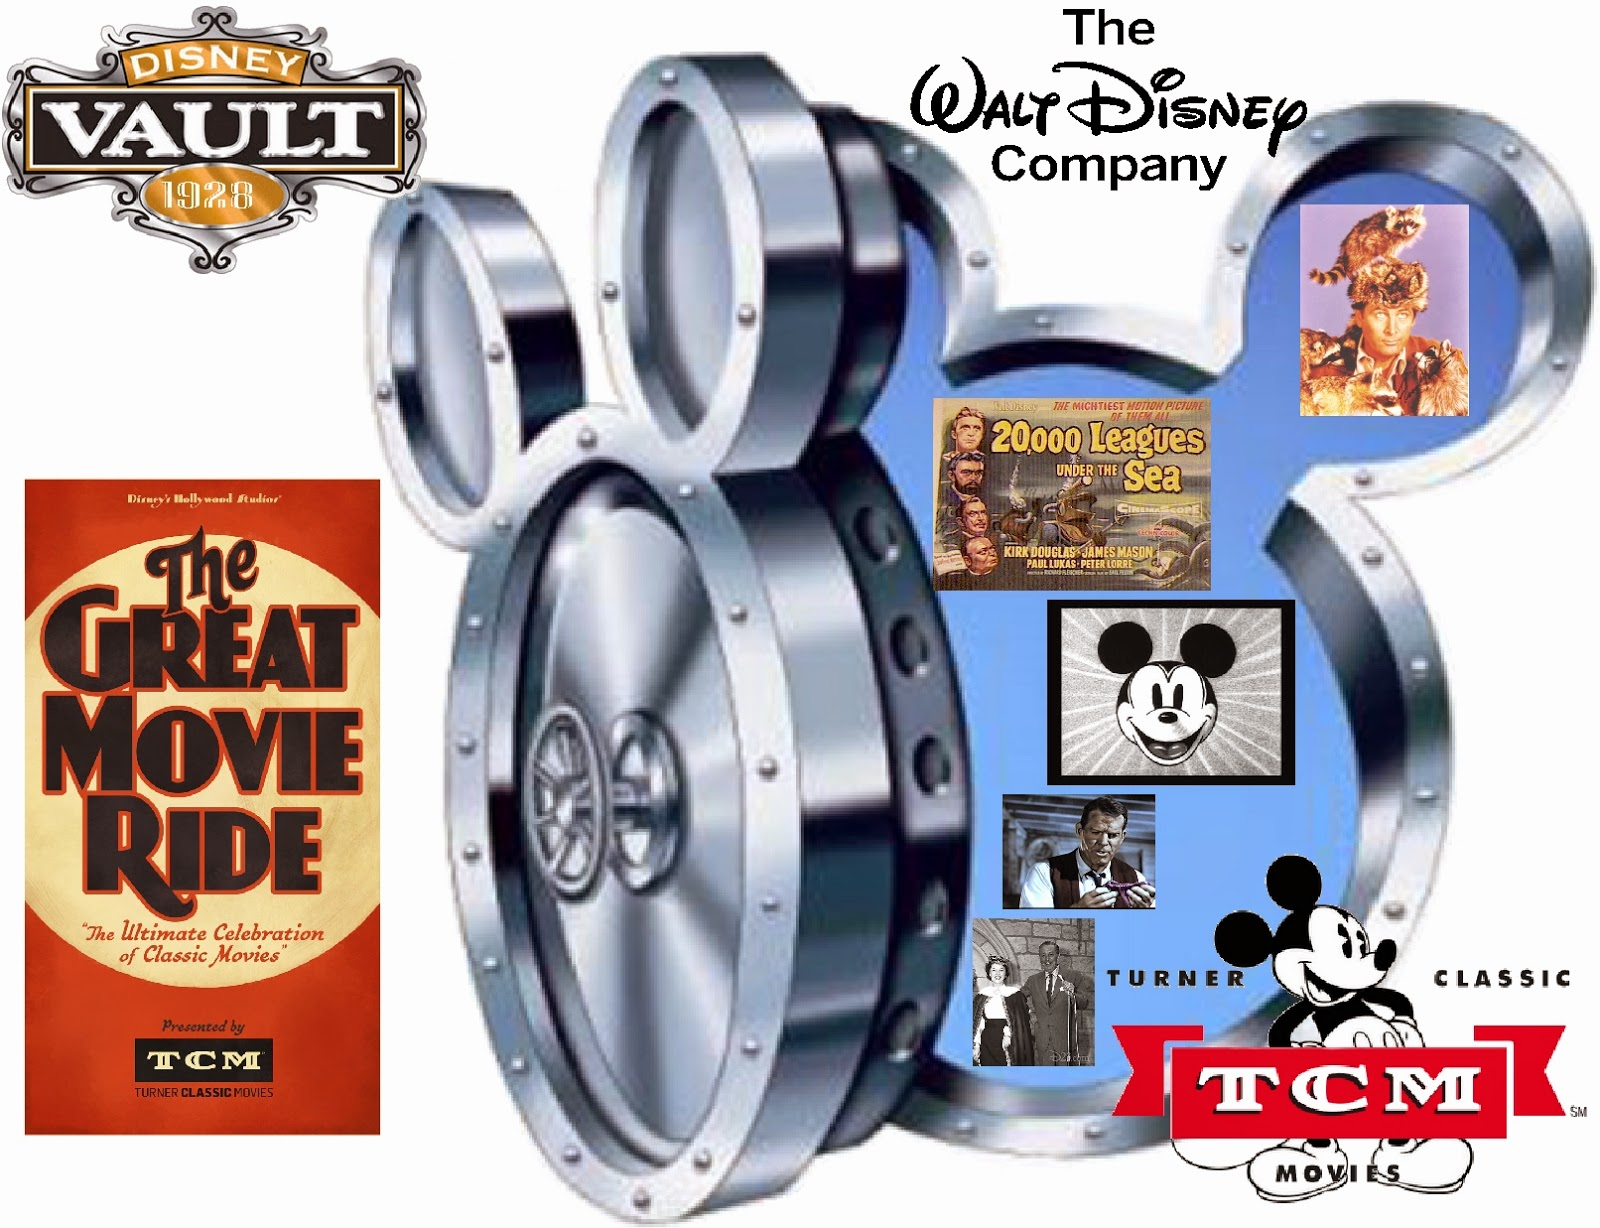 Disney vault movie list